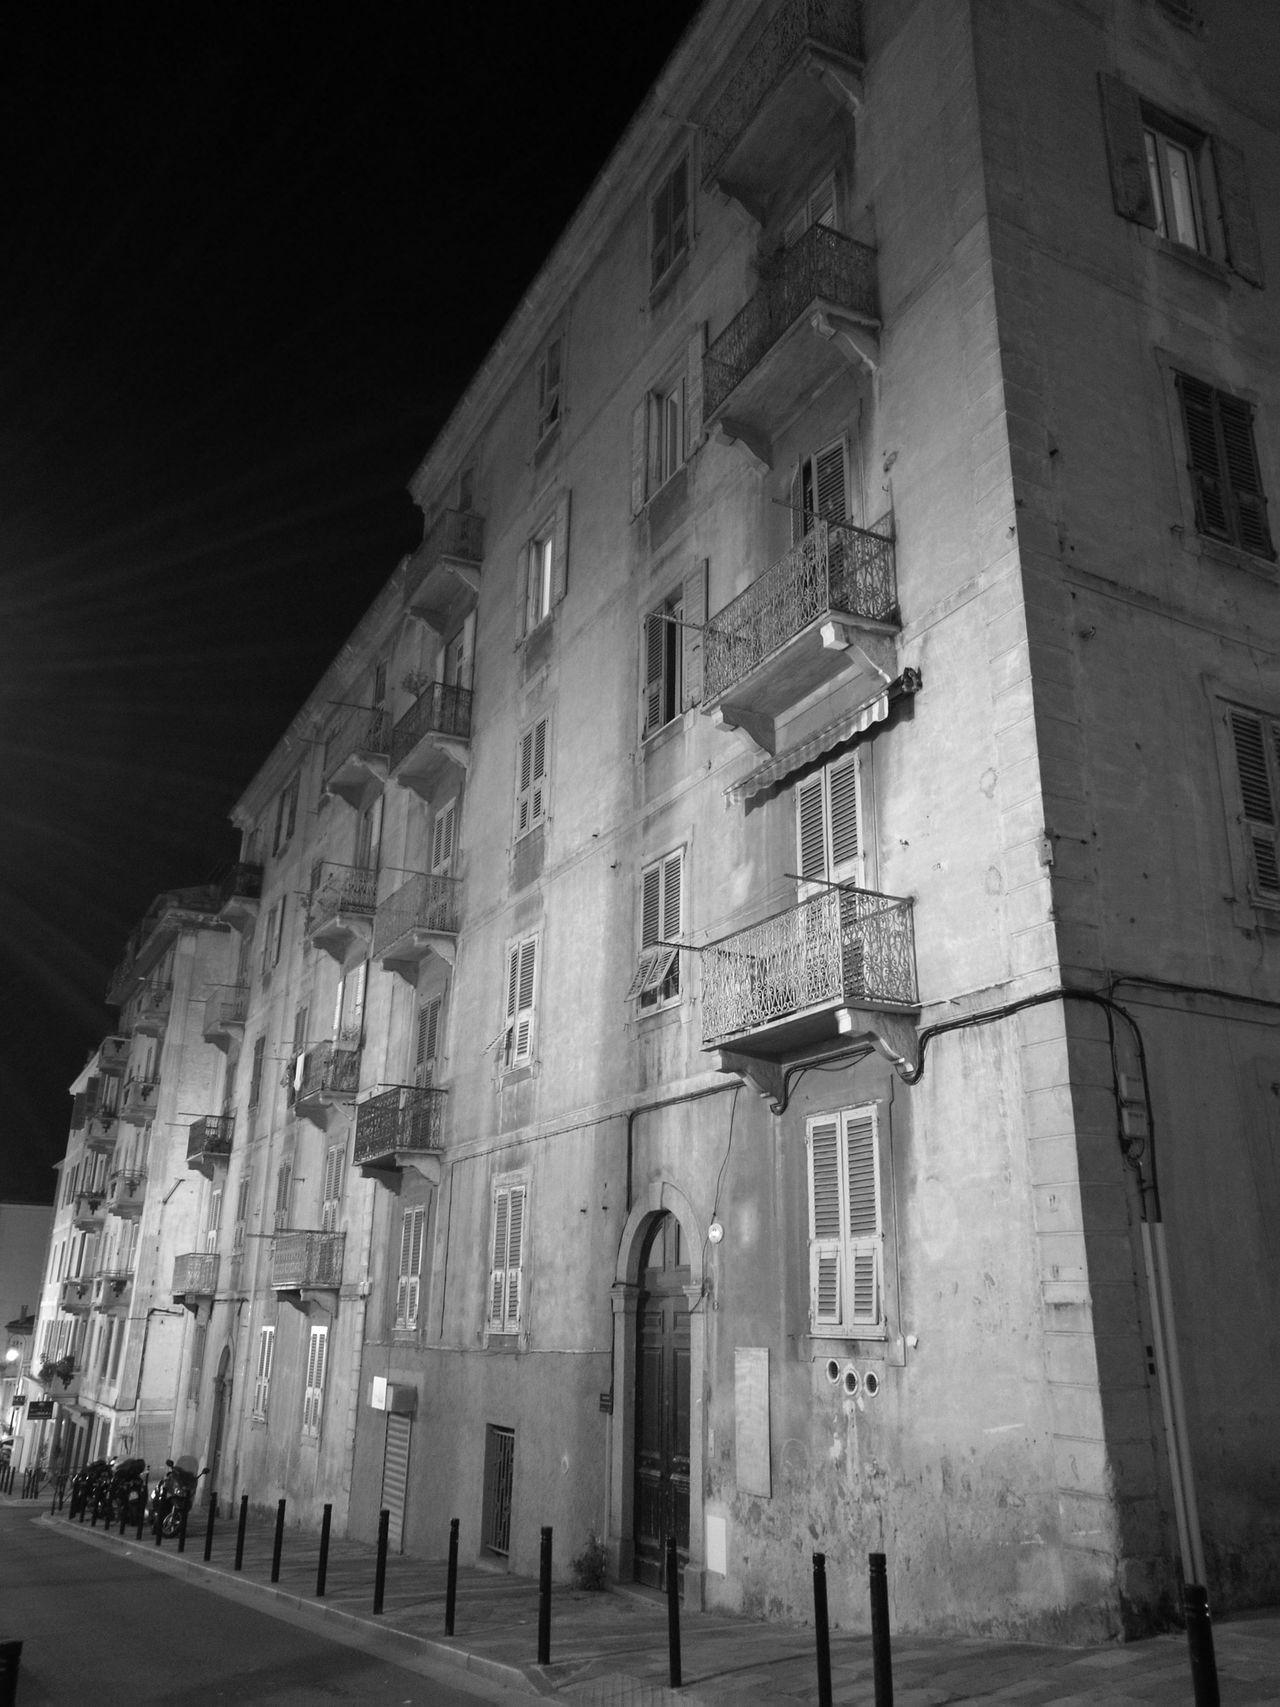 Building Exterior Architecture Built Structure City No People Corse Ajaccio Nuit Photo De Nuit Ombres Et Lumières Nightphotography Light And Shadow City Night